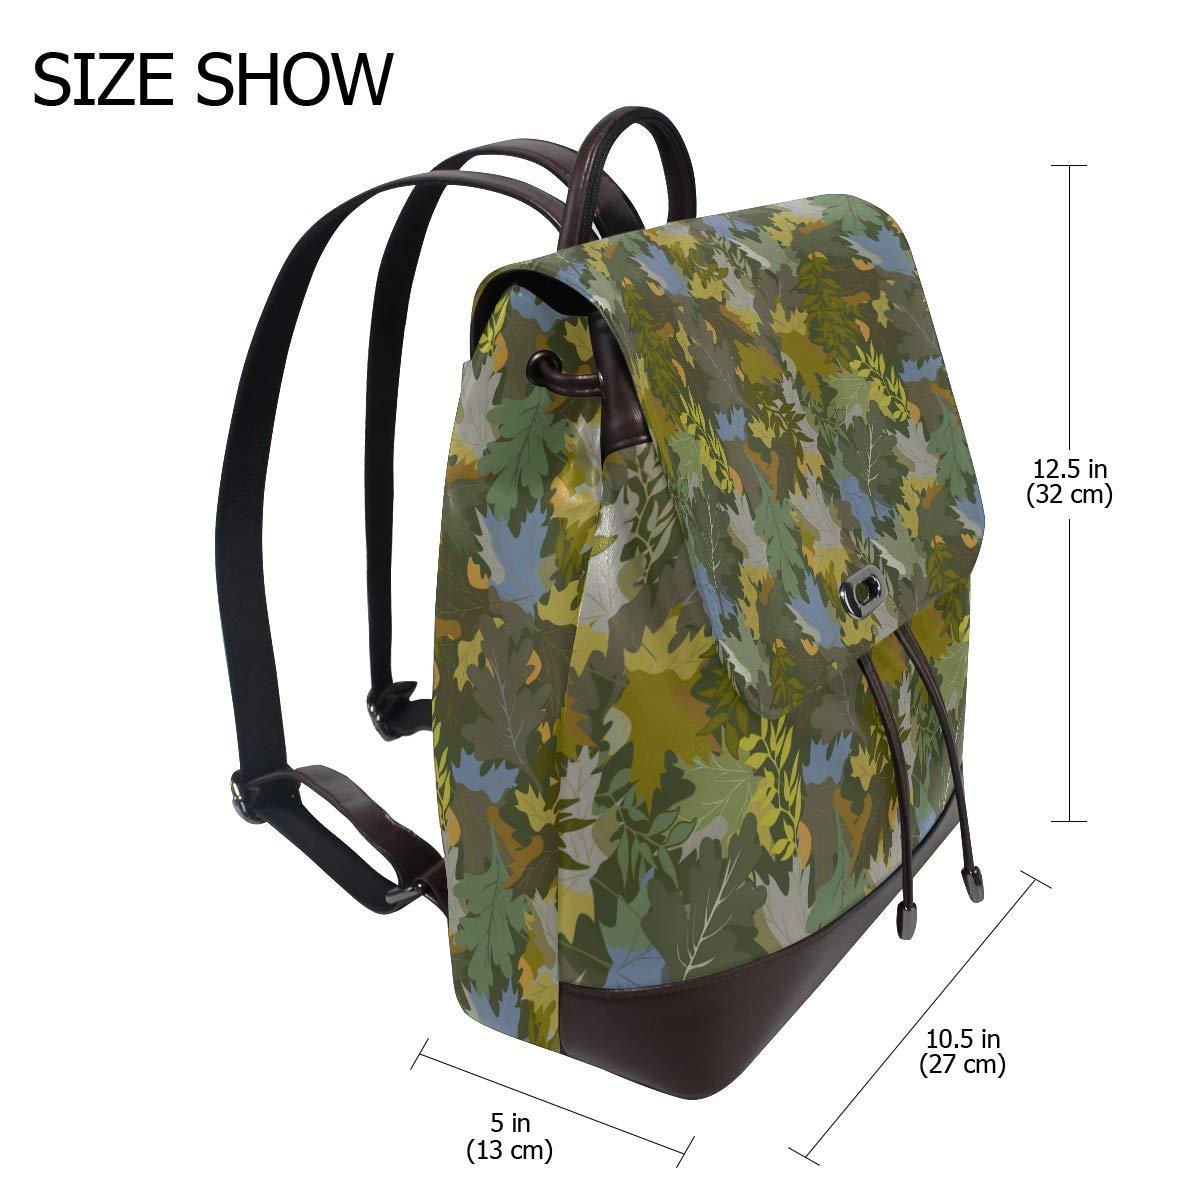 Unisex PU Leather Backpack Orange Army Jungle Camo Print Womens Casual Daypack Mens Travel Sports Bag Boys College Bookbag